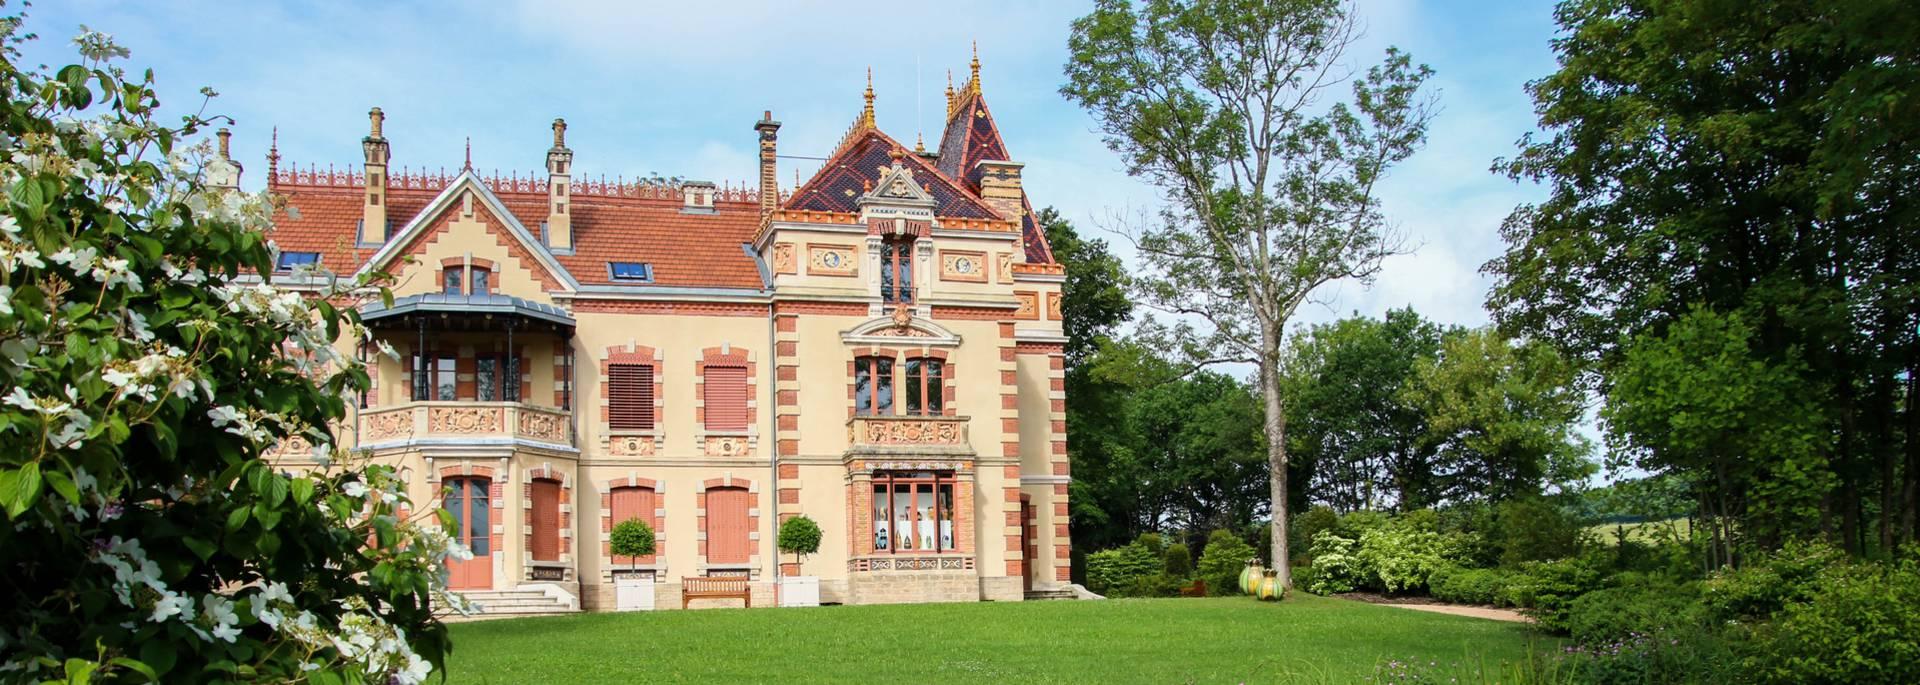 Façade principale et jardin de la Villa Perrusson, Écuisses. © Lesley Williamson.